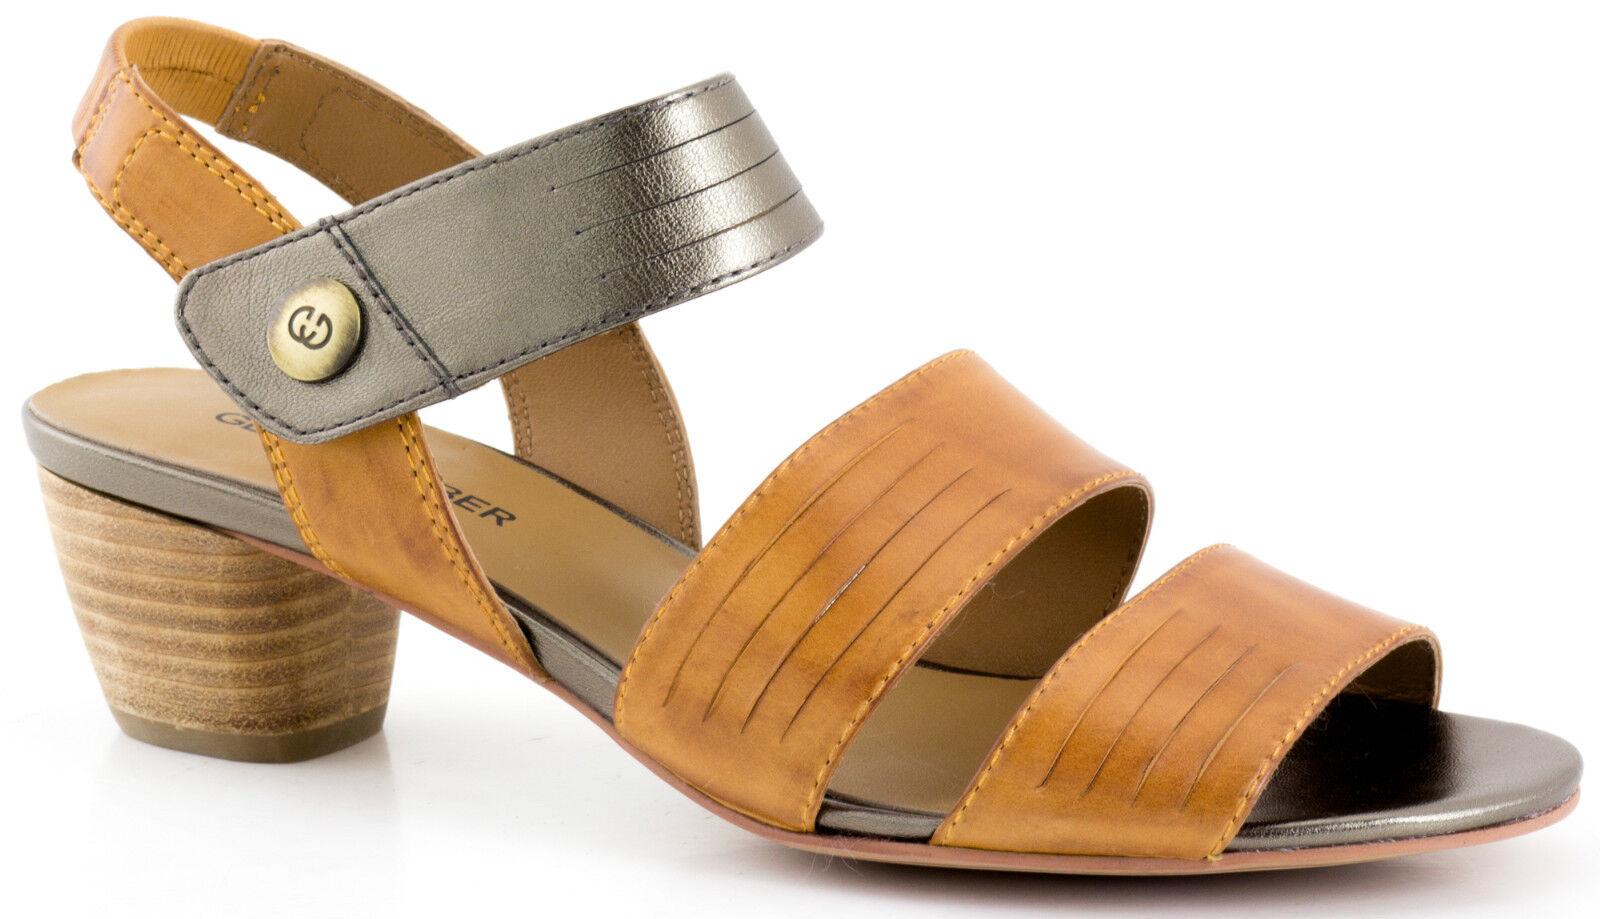 Ladies Slingback Sandal Gerry Weber Jenifer 03 Cognac EU EU EU Size 37, 38, 39 8aa1c3